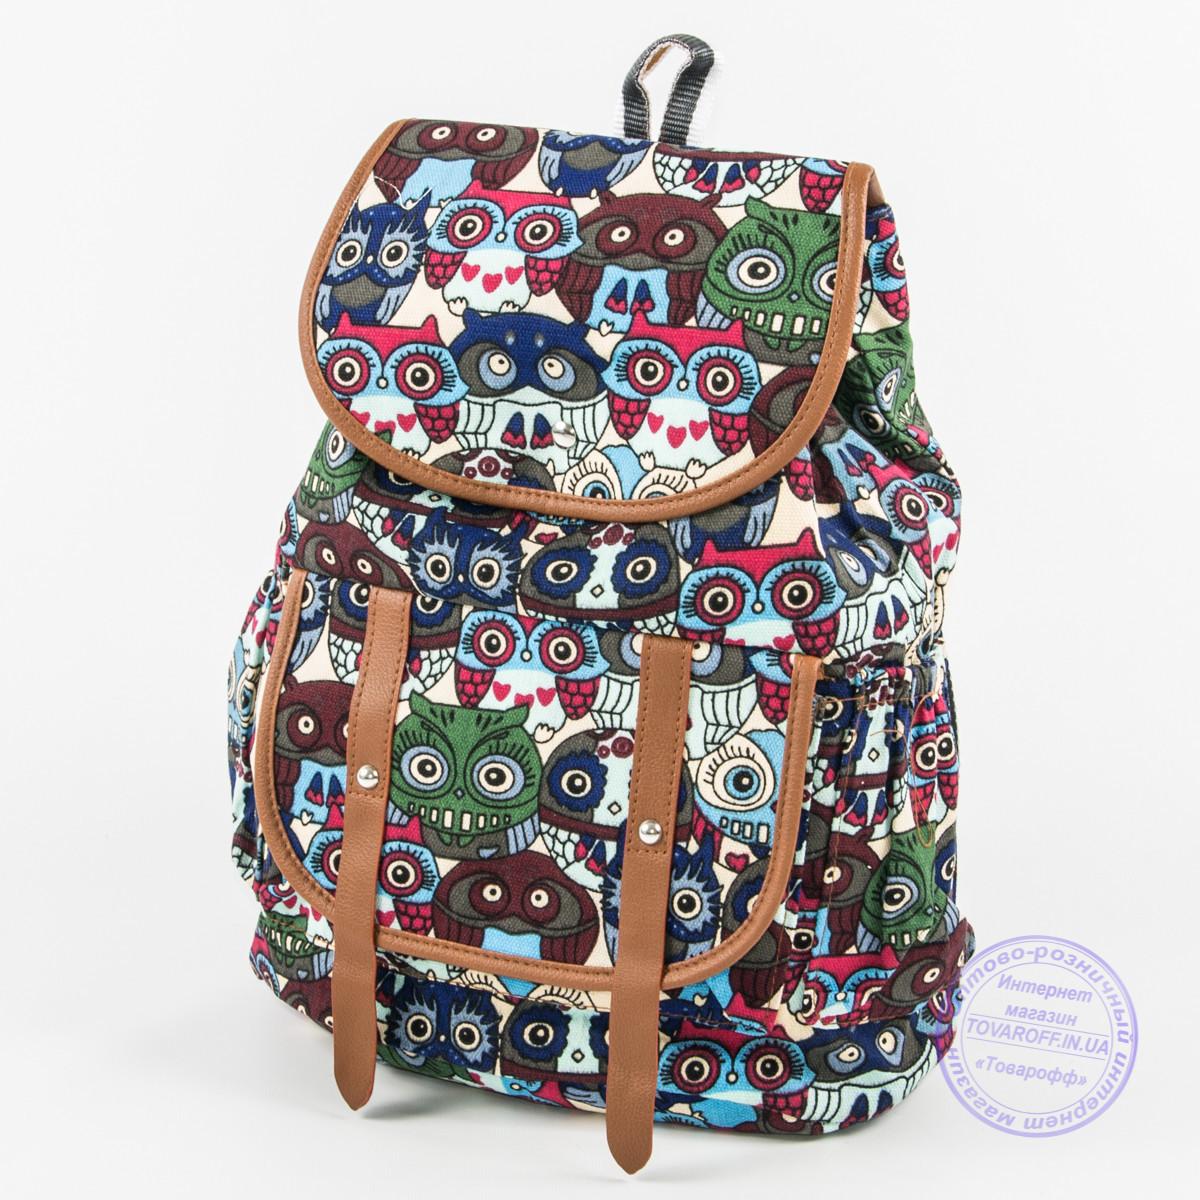 Оптом рюкзак для девочки с совами - синий - 161